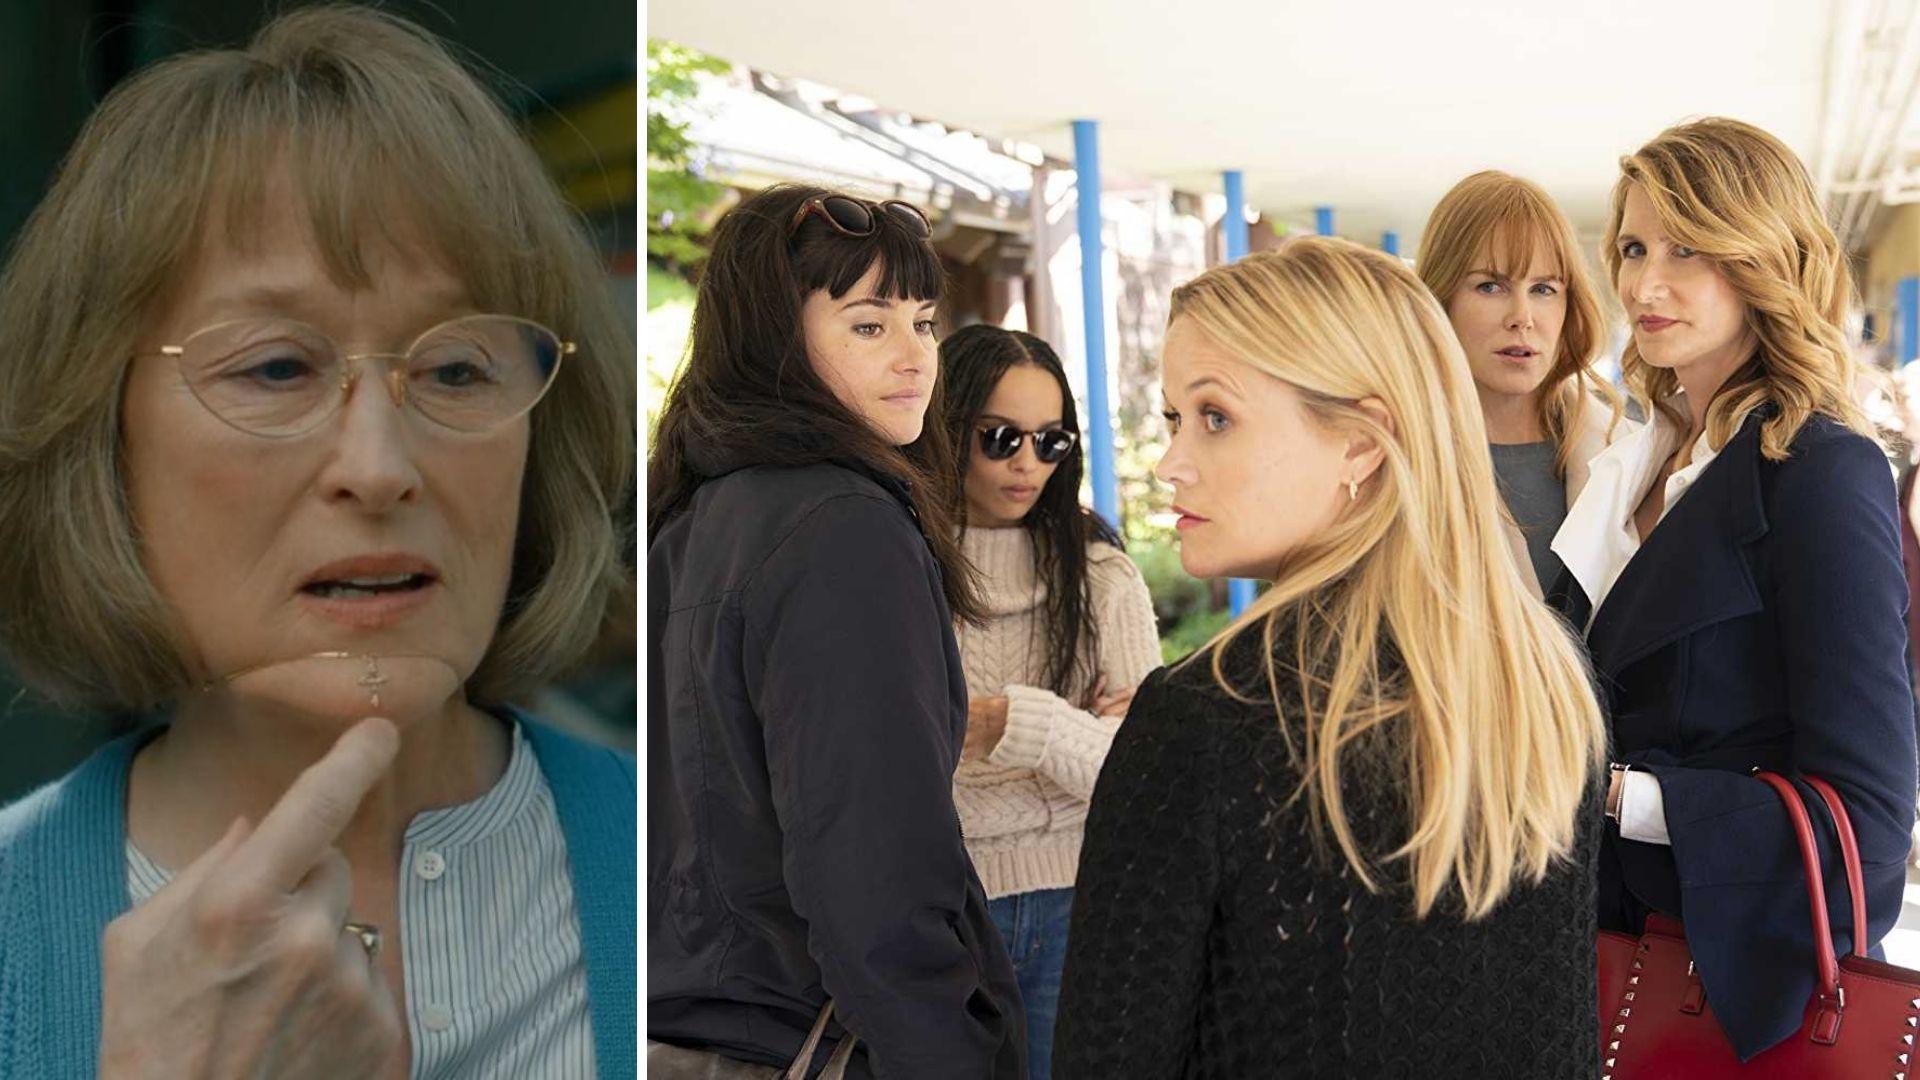 'Big Little Lies' Season 2 Is a Meryl Streep Show All the Way